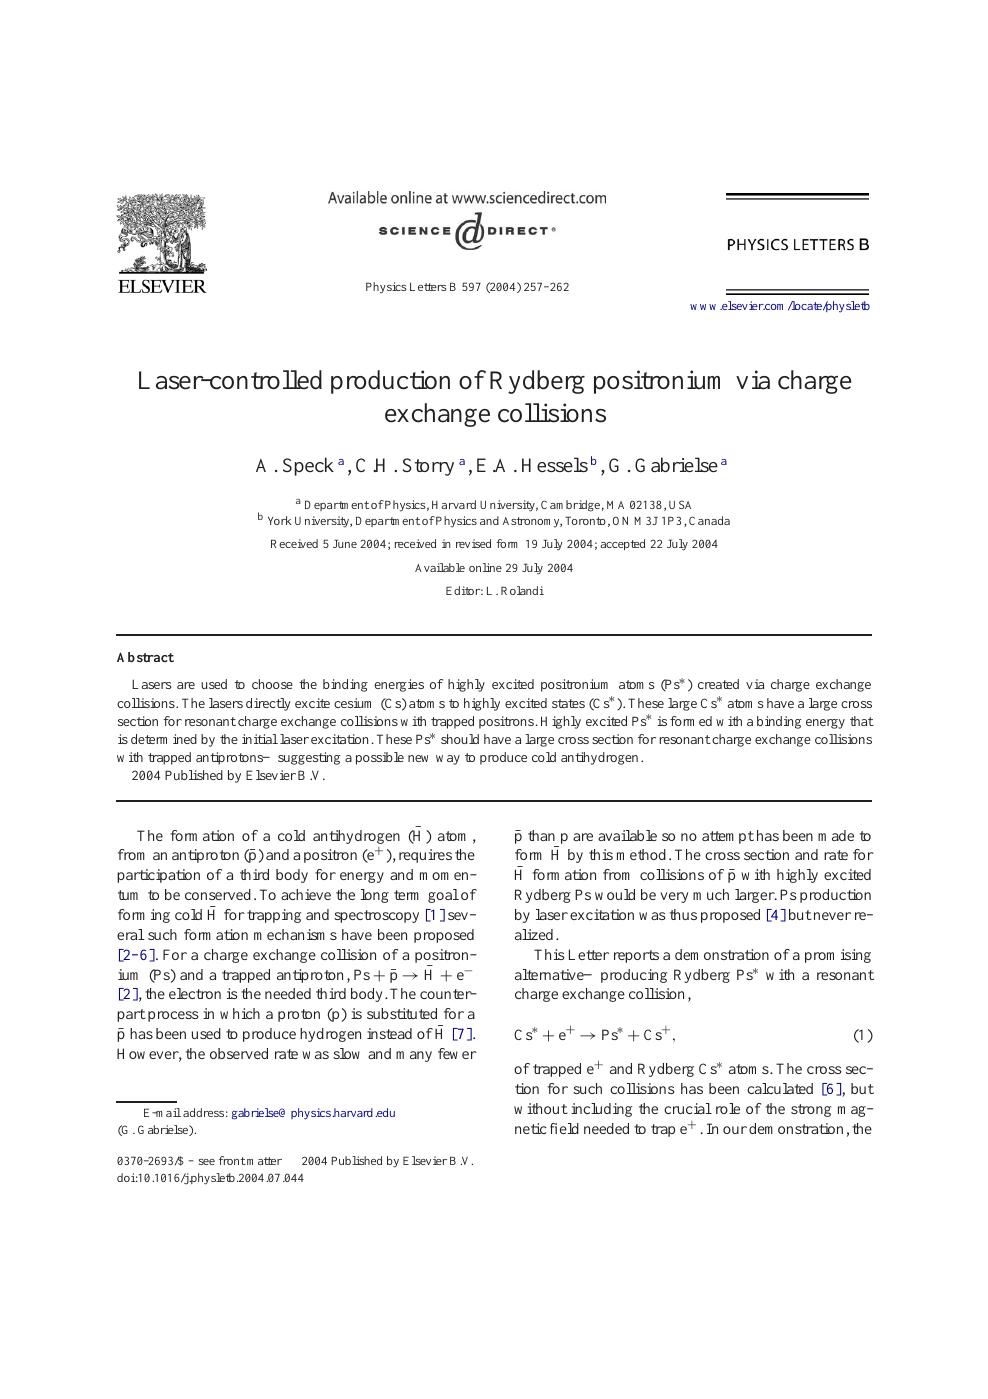 Laser-controlled production of Rydberg positronium via